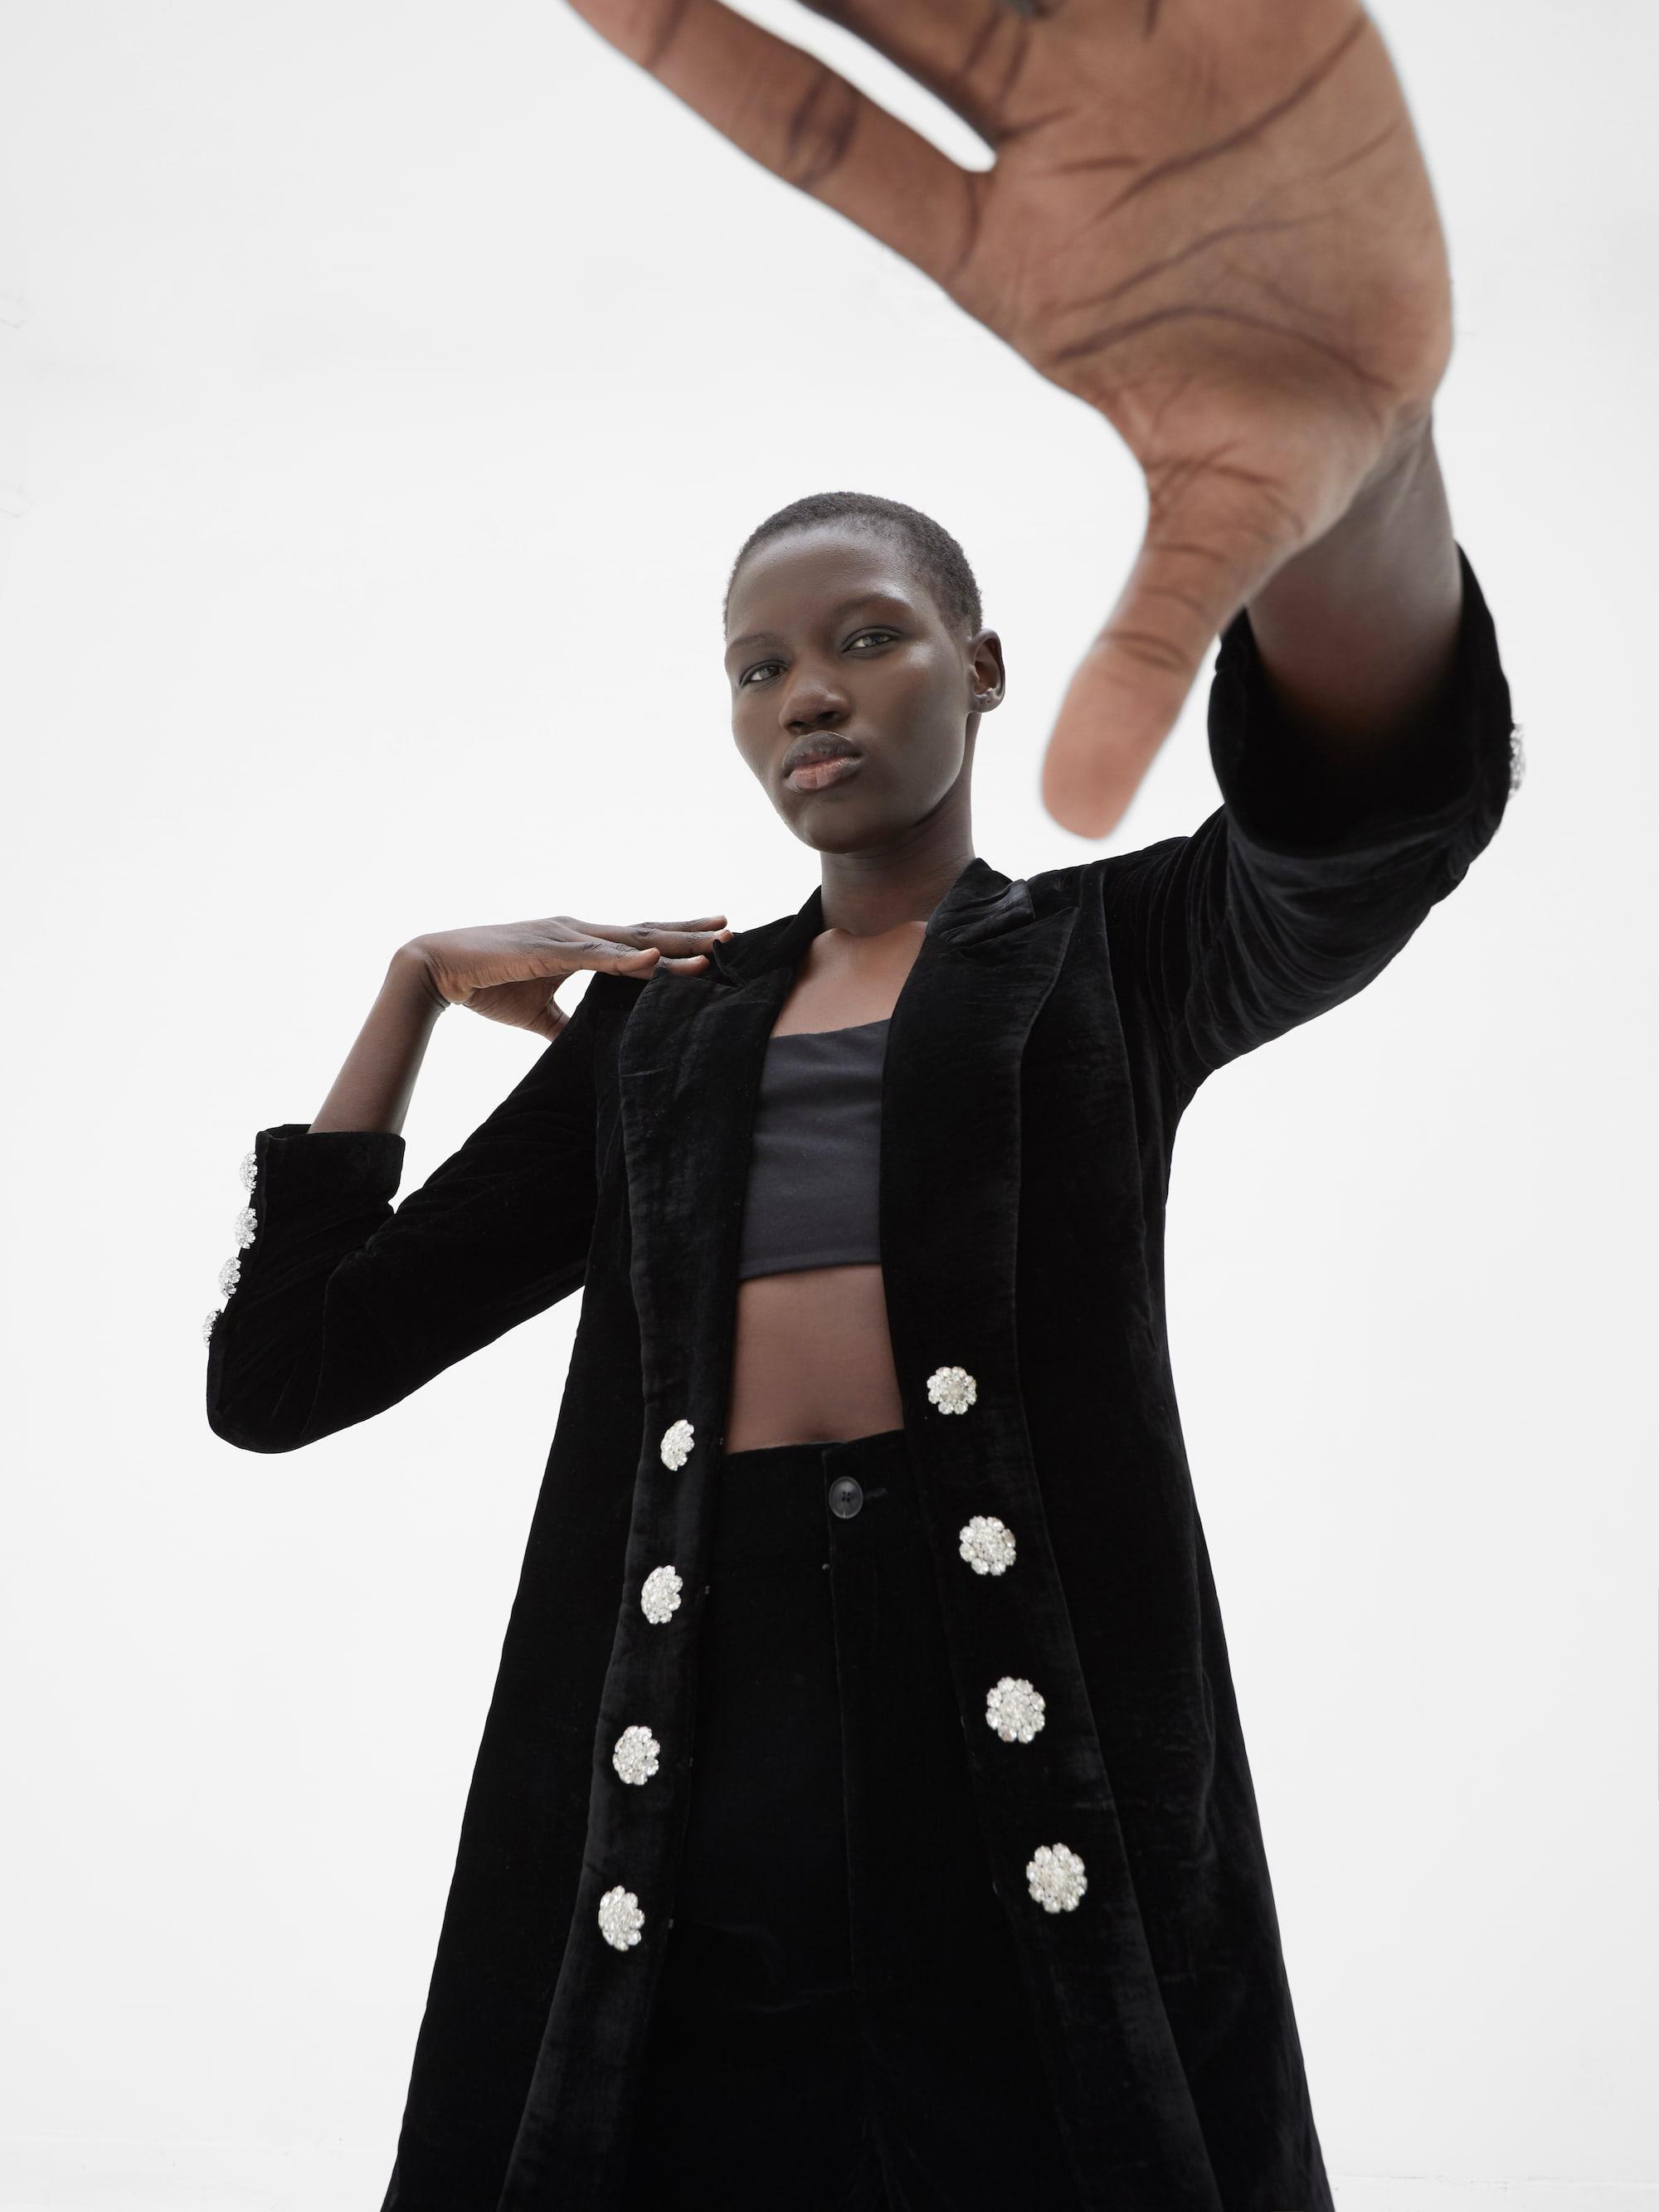 View 3 of model wearing Kezia Kimono in black.